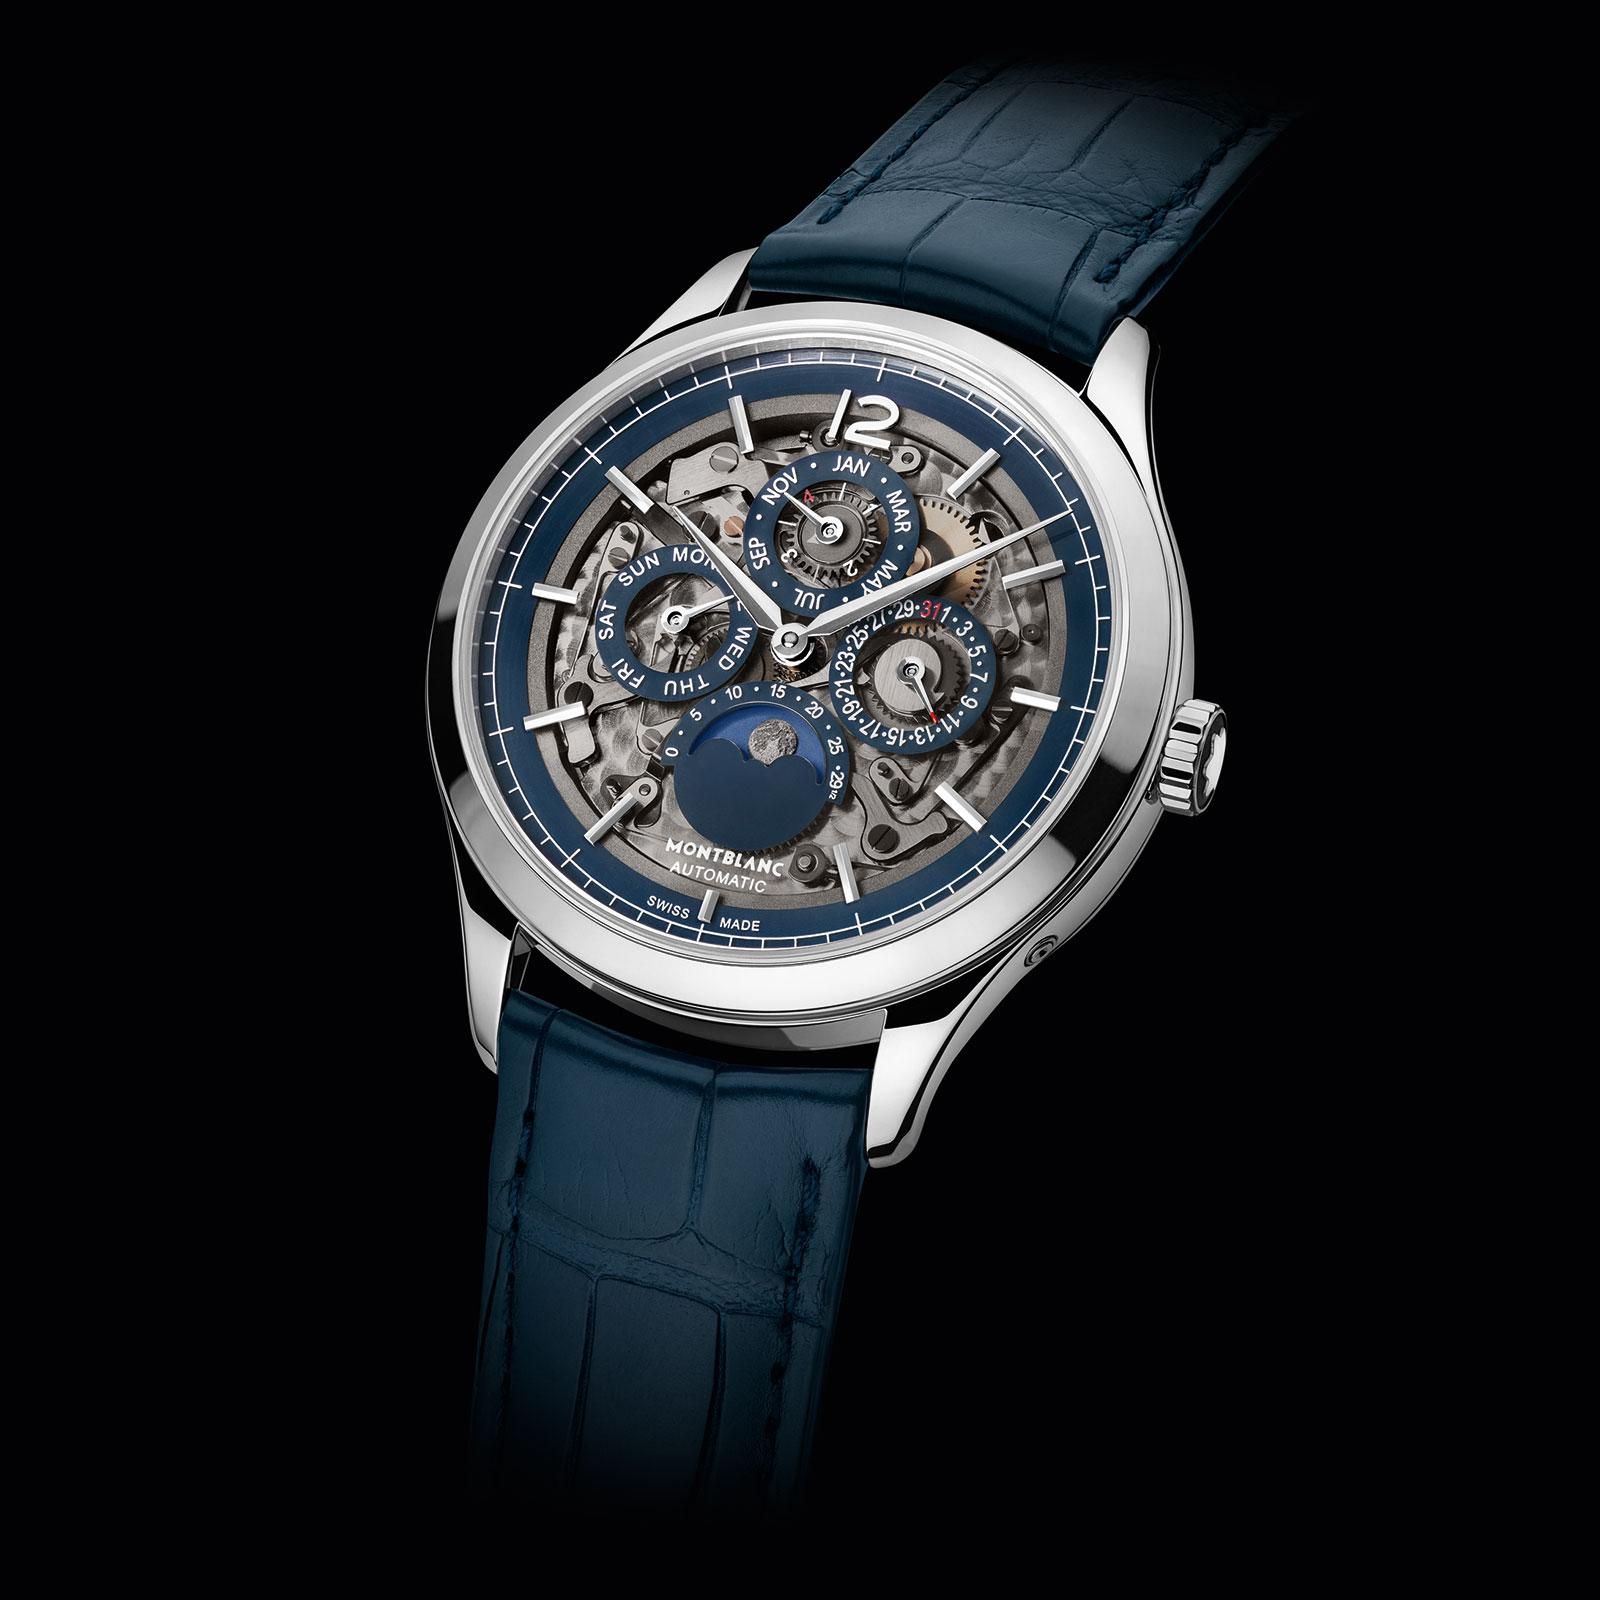 Montblanc-Heritage-Chronométrie-Perpetual-Calendar-Sapphire dial